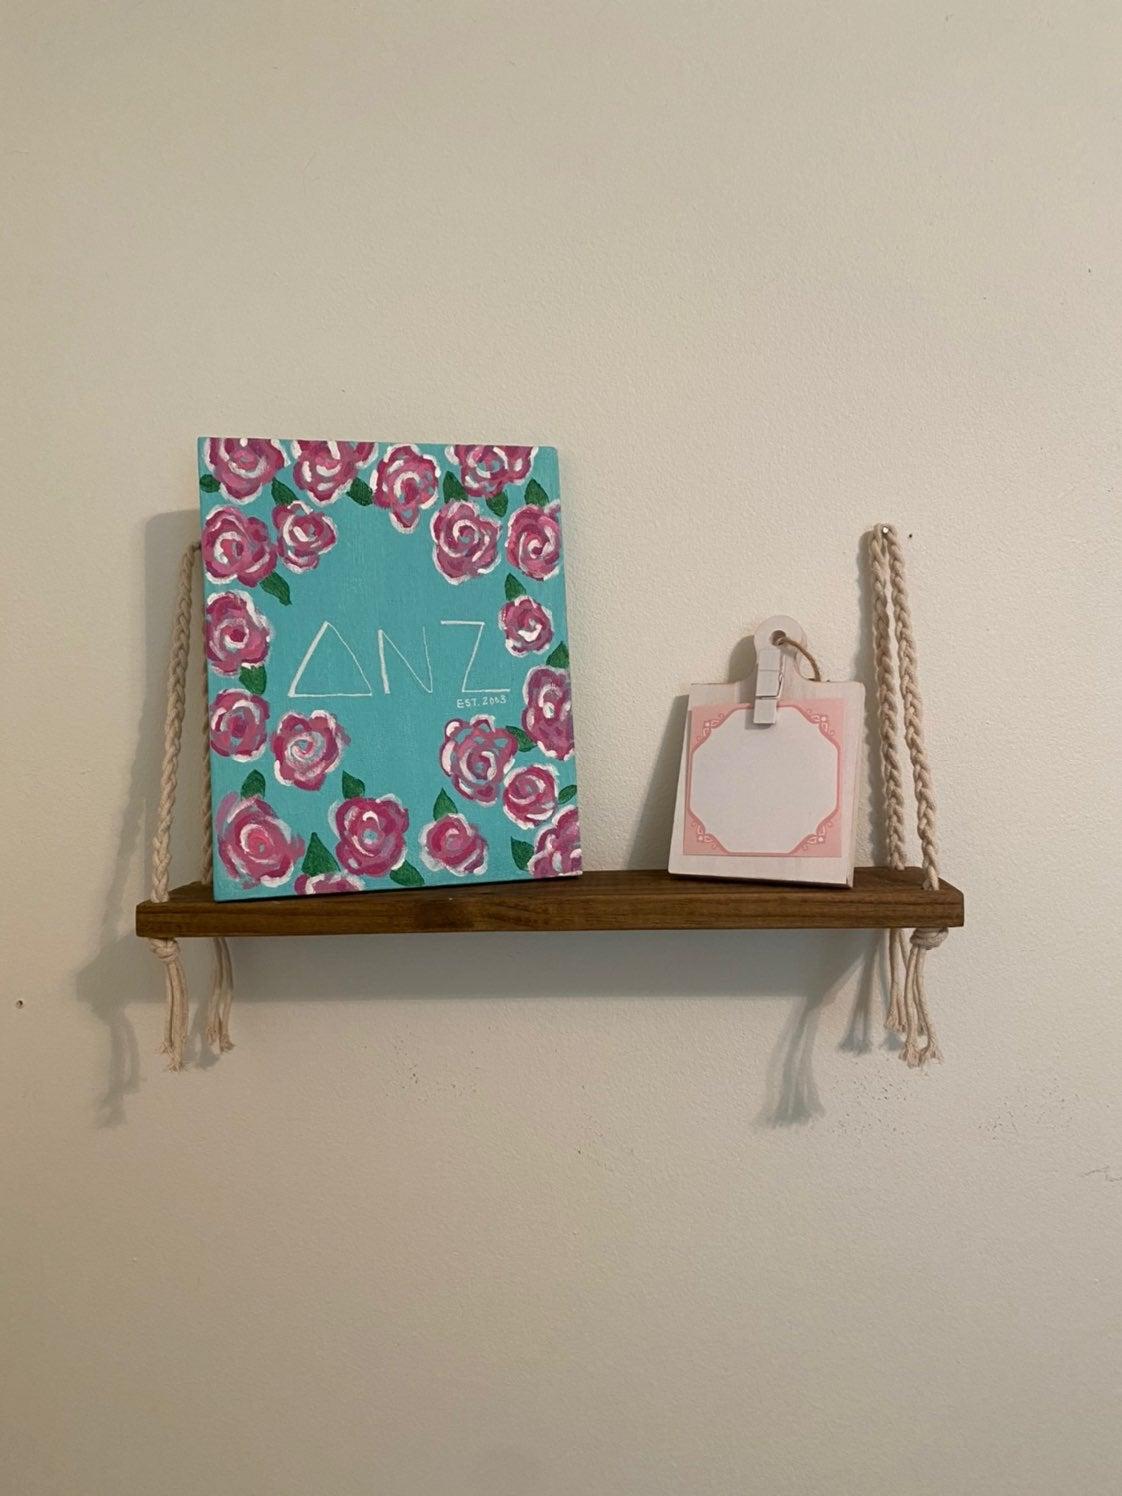 Hanging macrame shelf